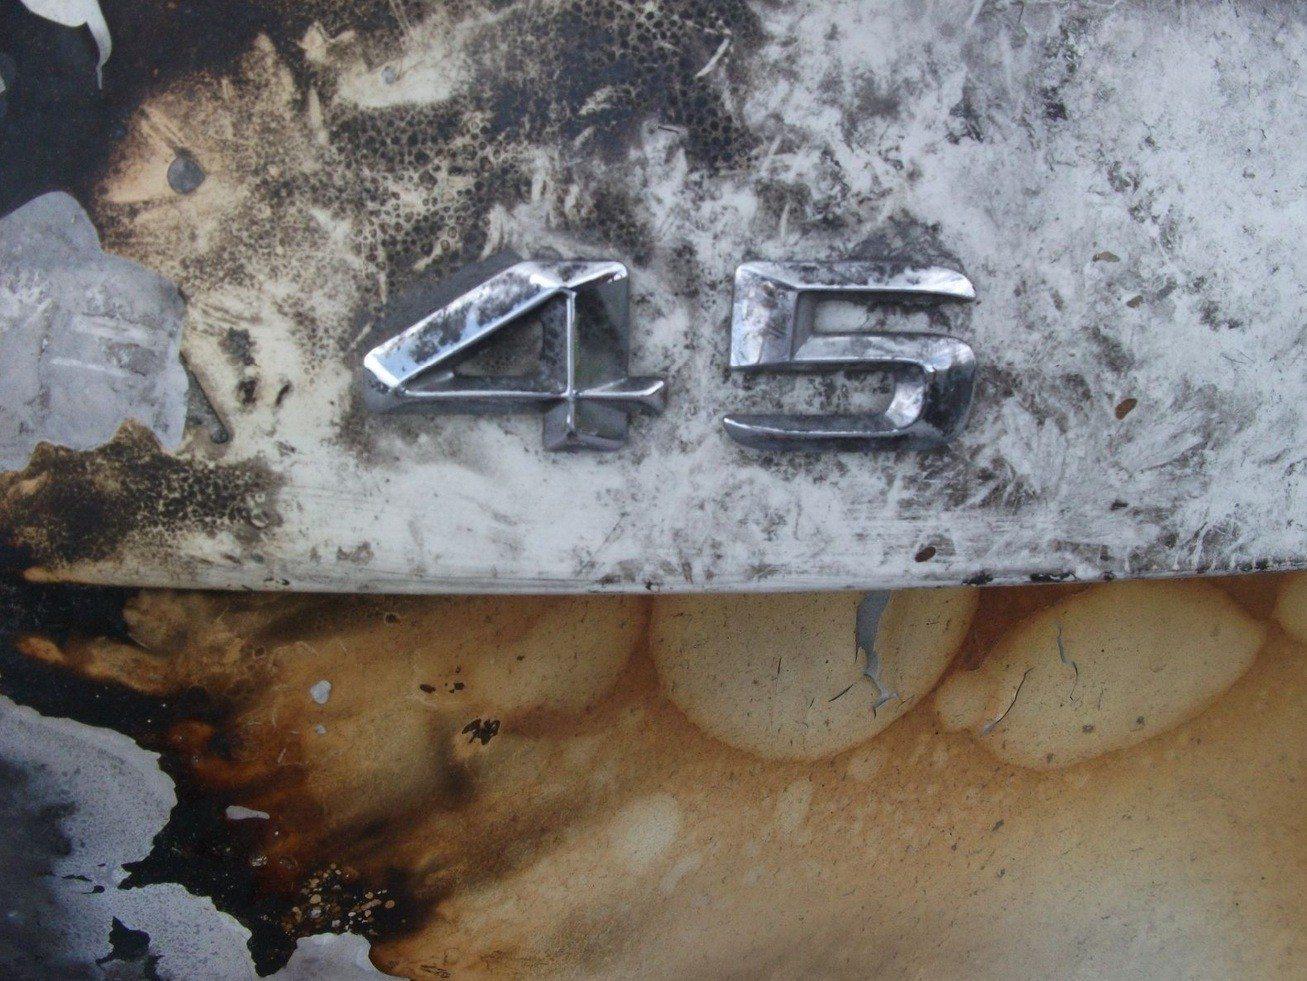 Wrecked Mercedes-Benz A45 AMG